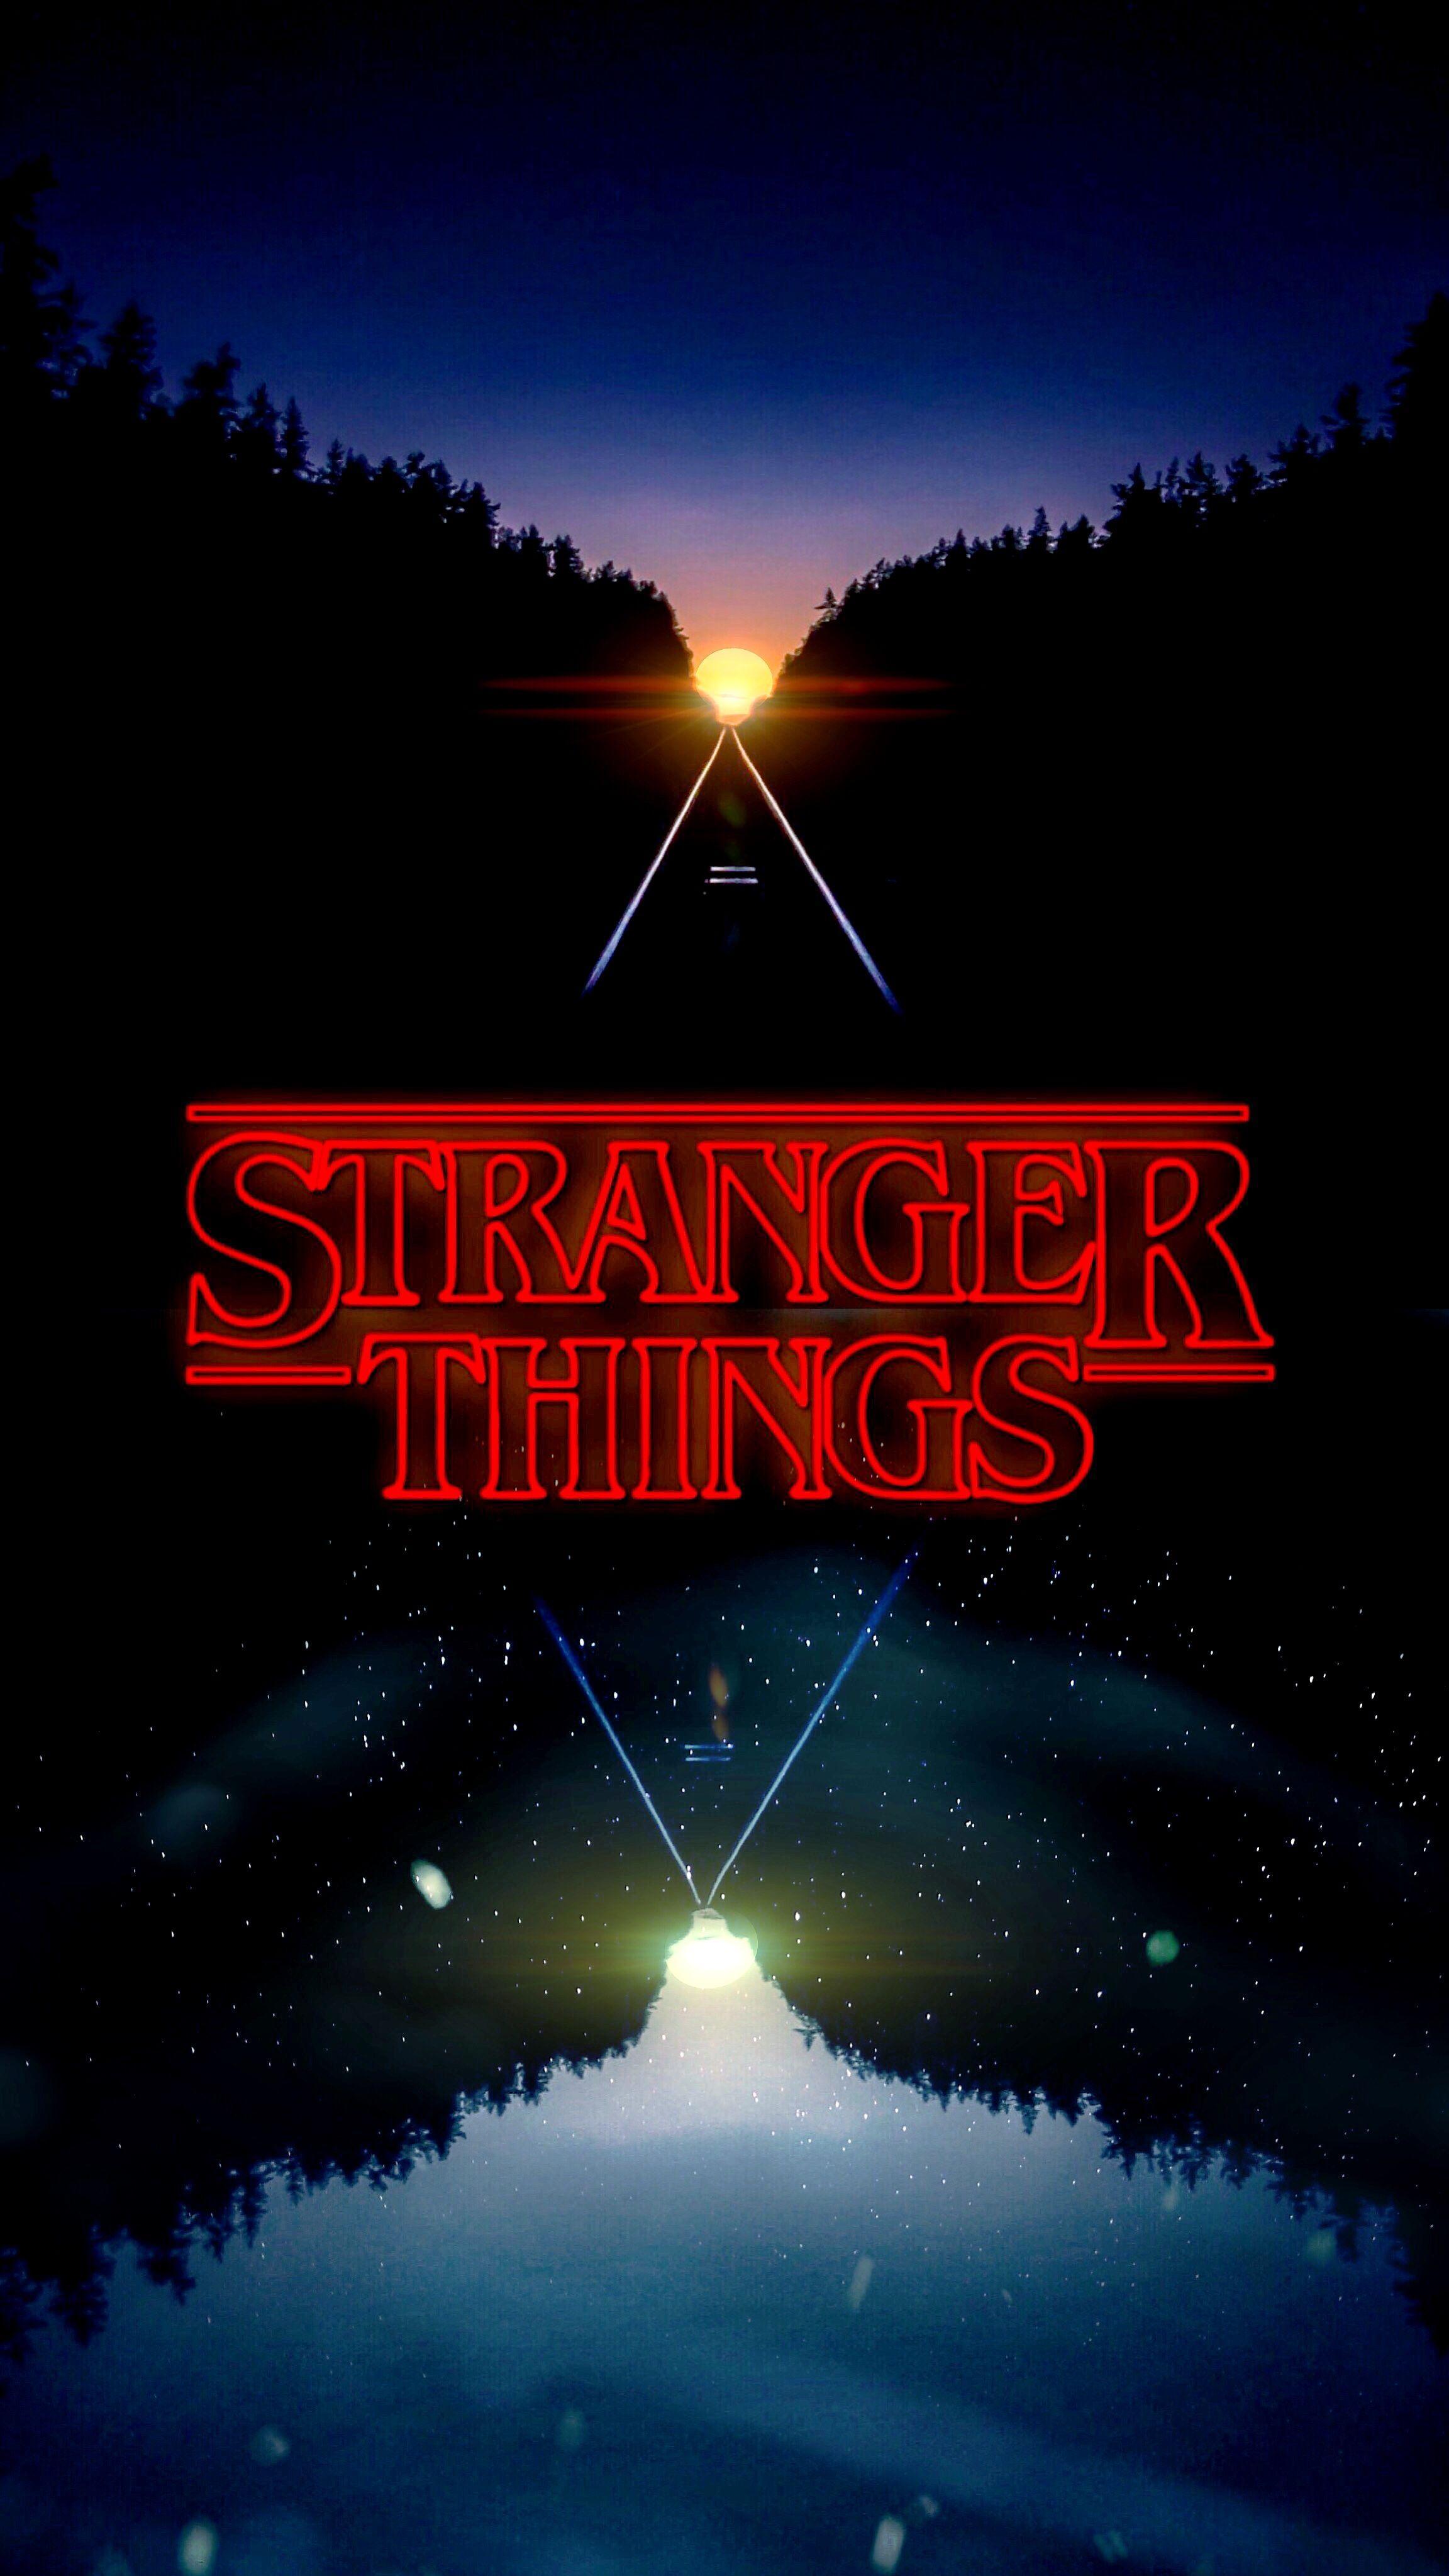 Stranger Things Aesthetic Wallpapers Top Free Stranger Things